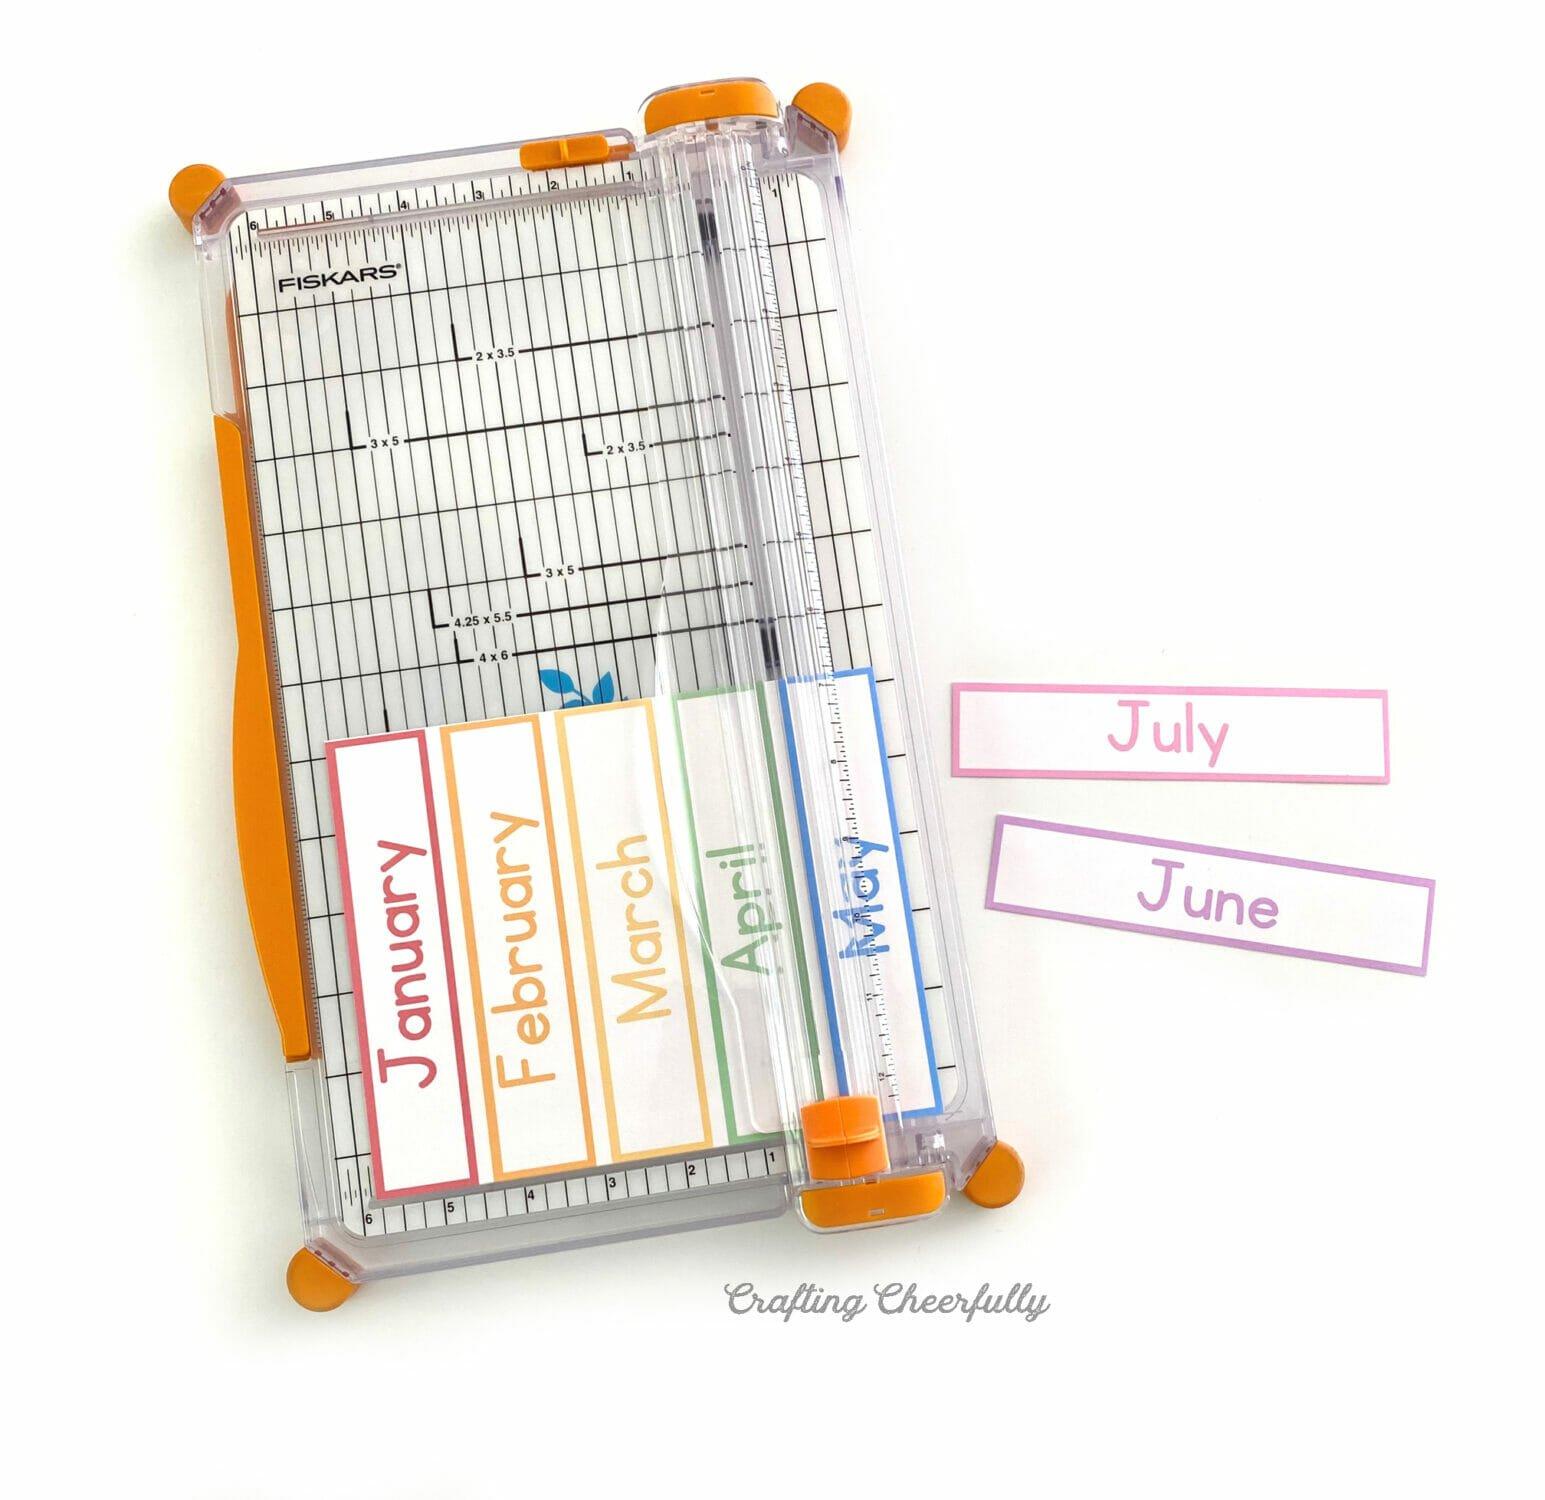 Paper trimmer cutting calendar pieces